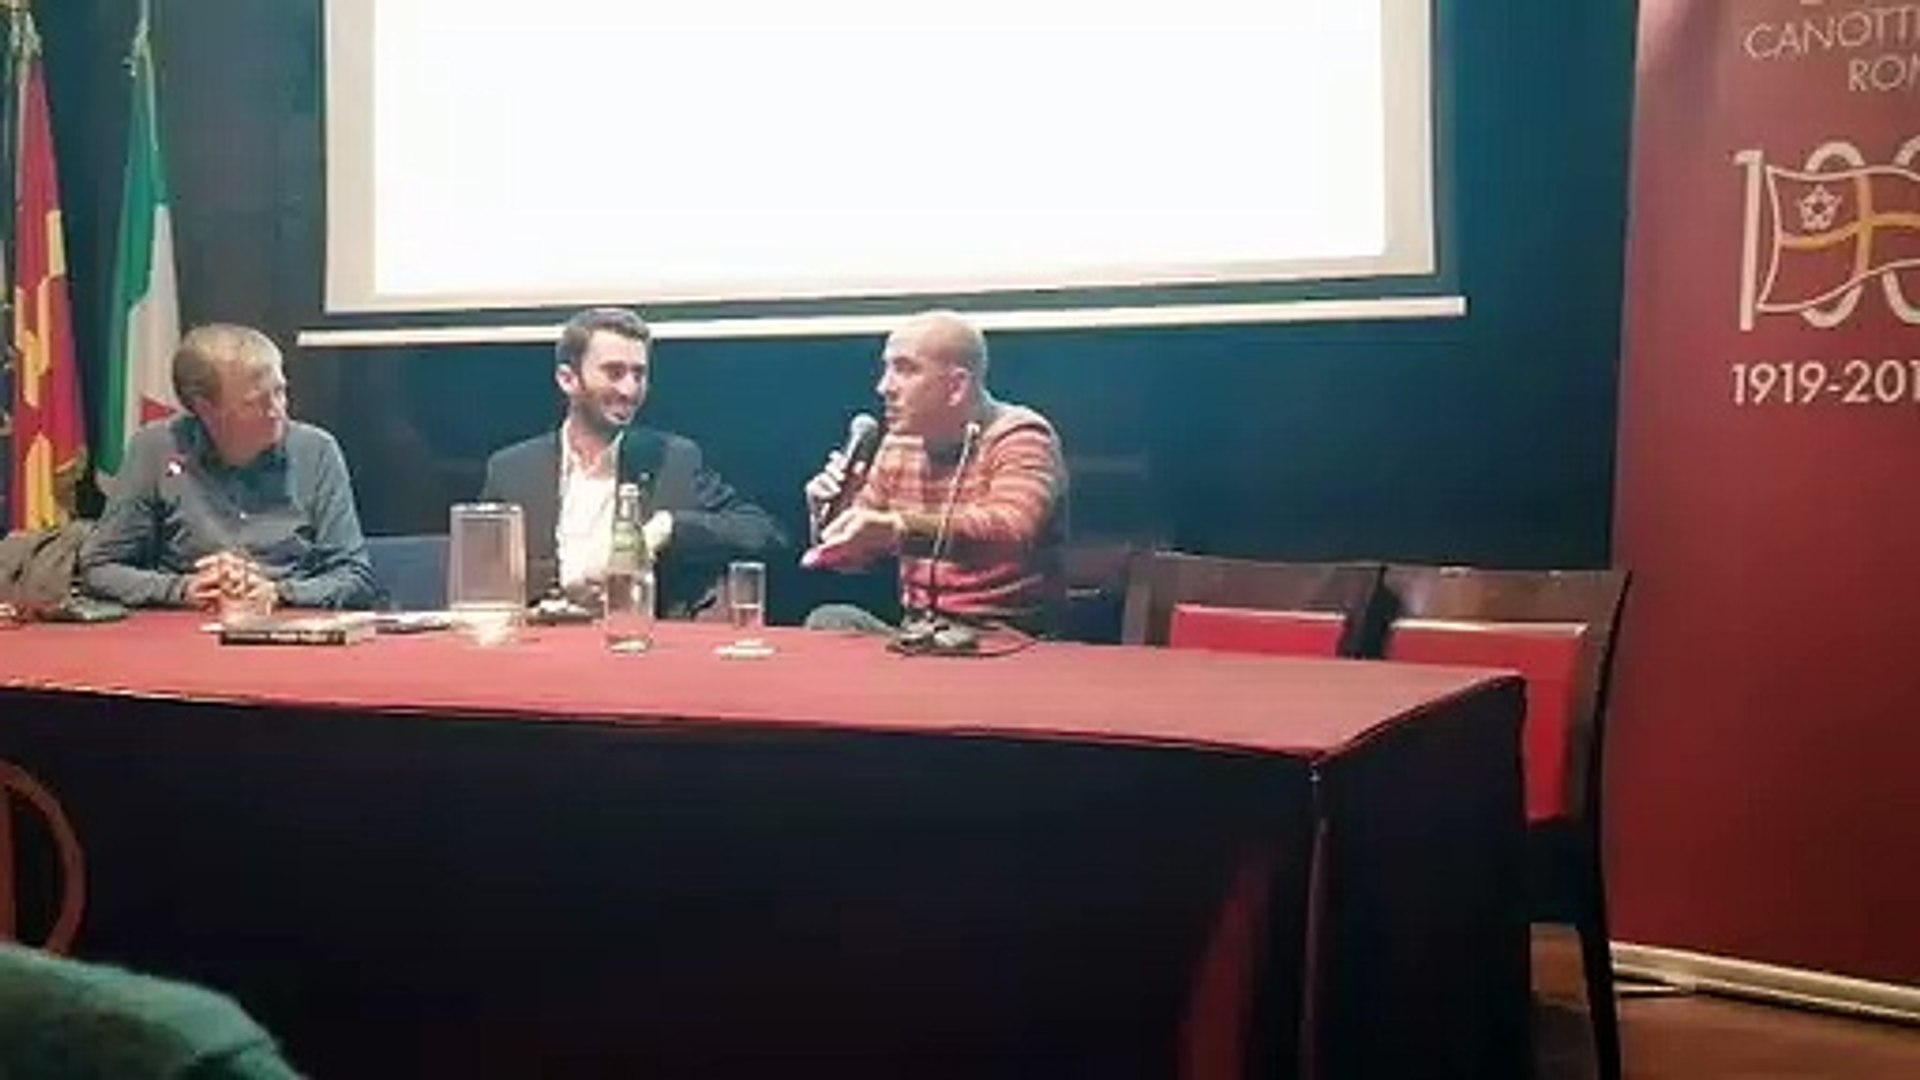 Di Canio racconta il gesto di fair paly in Everton - West Ham - Video  Dailymotion